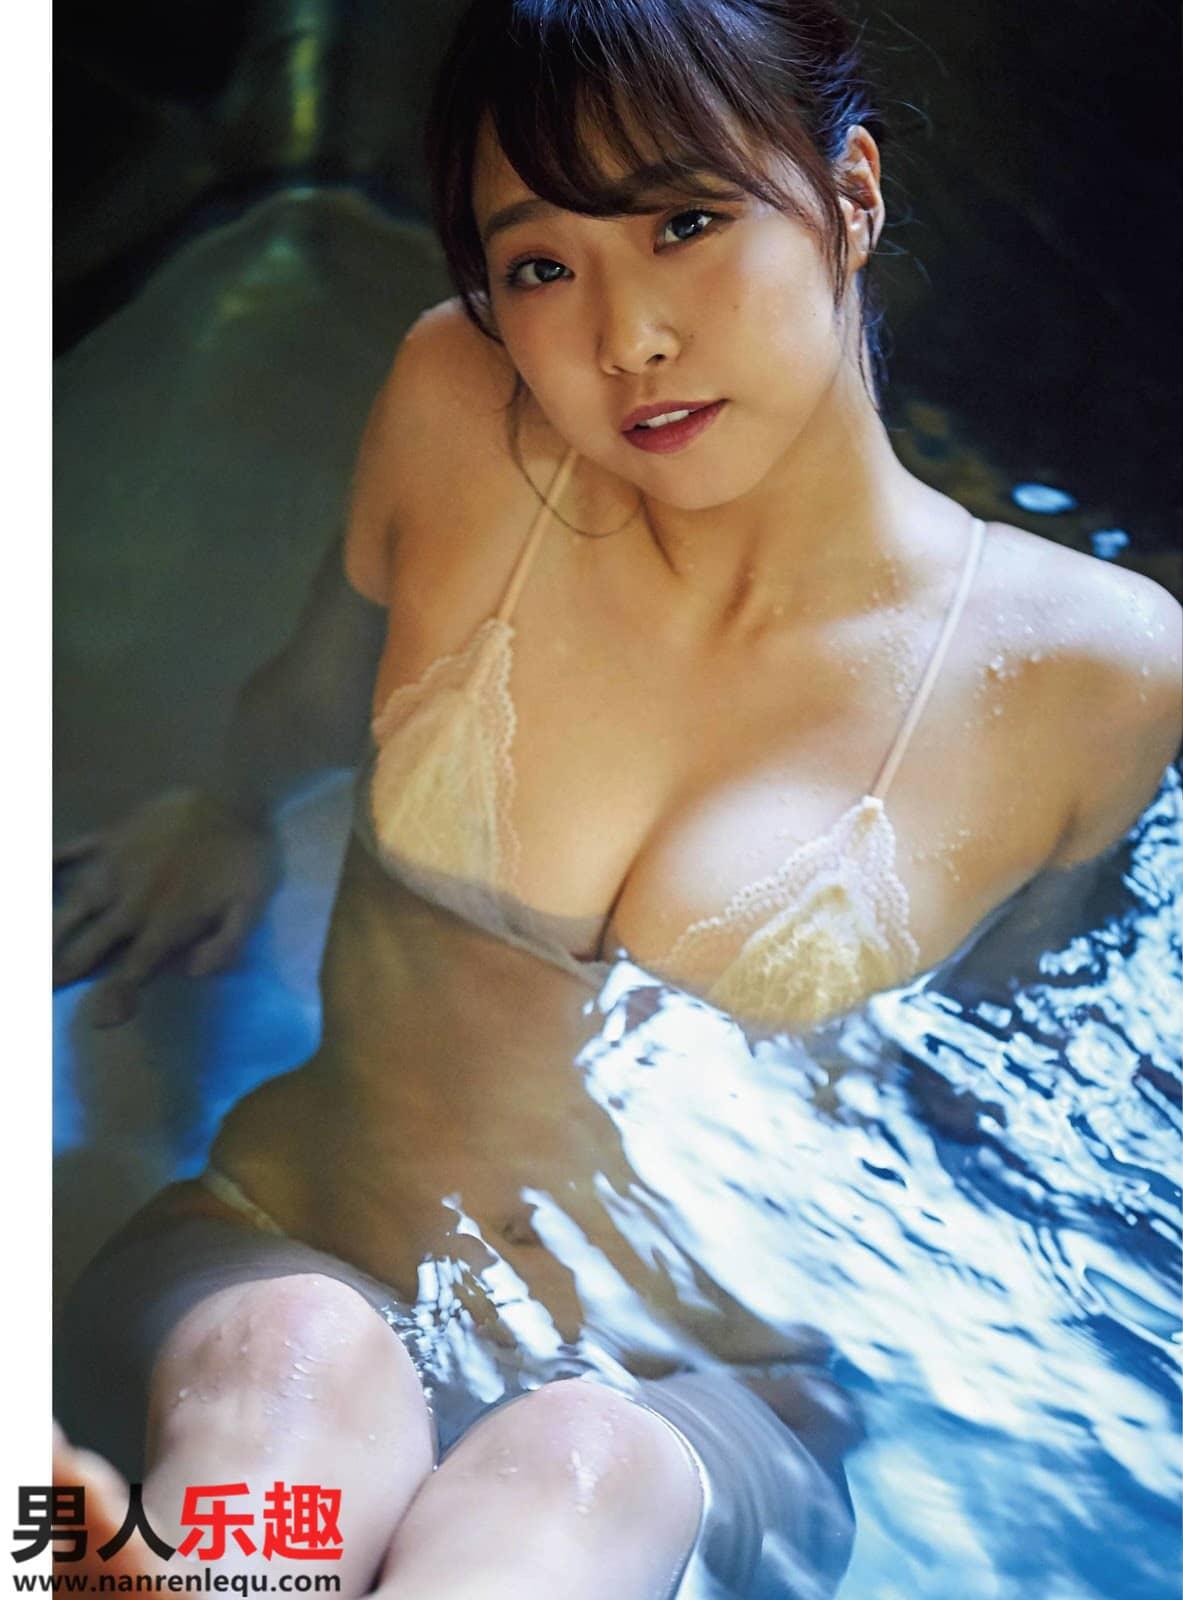 NMB48《加藤夕夏》邻家女孩笑容甜美